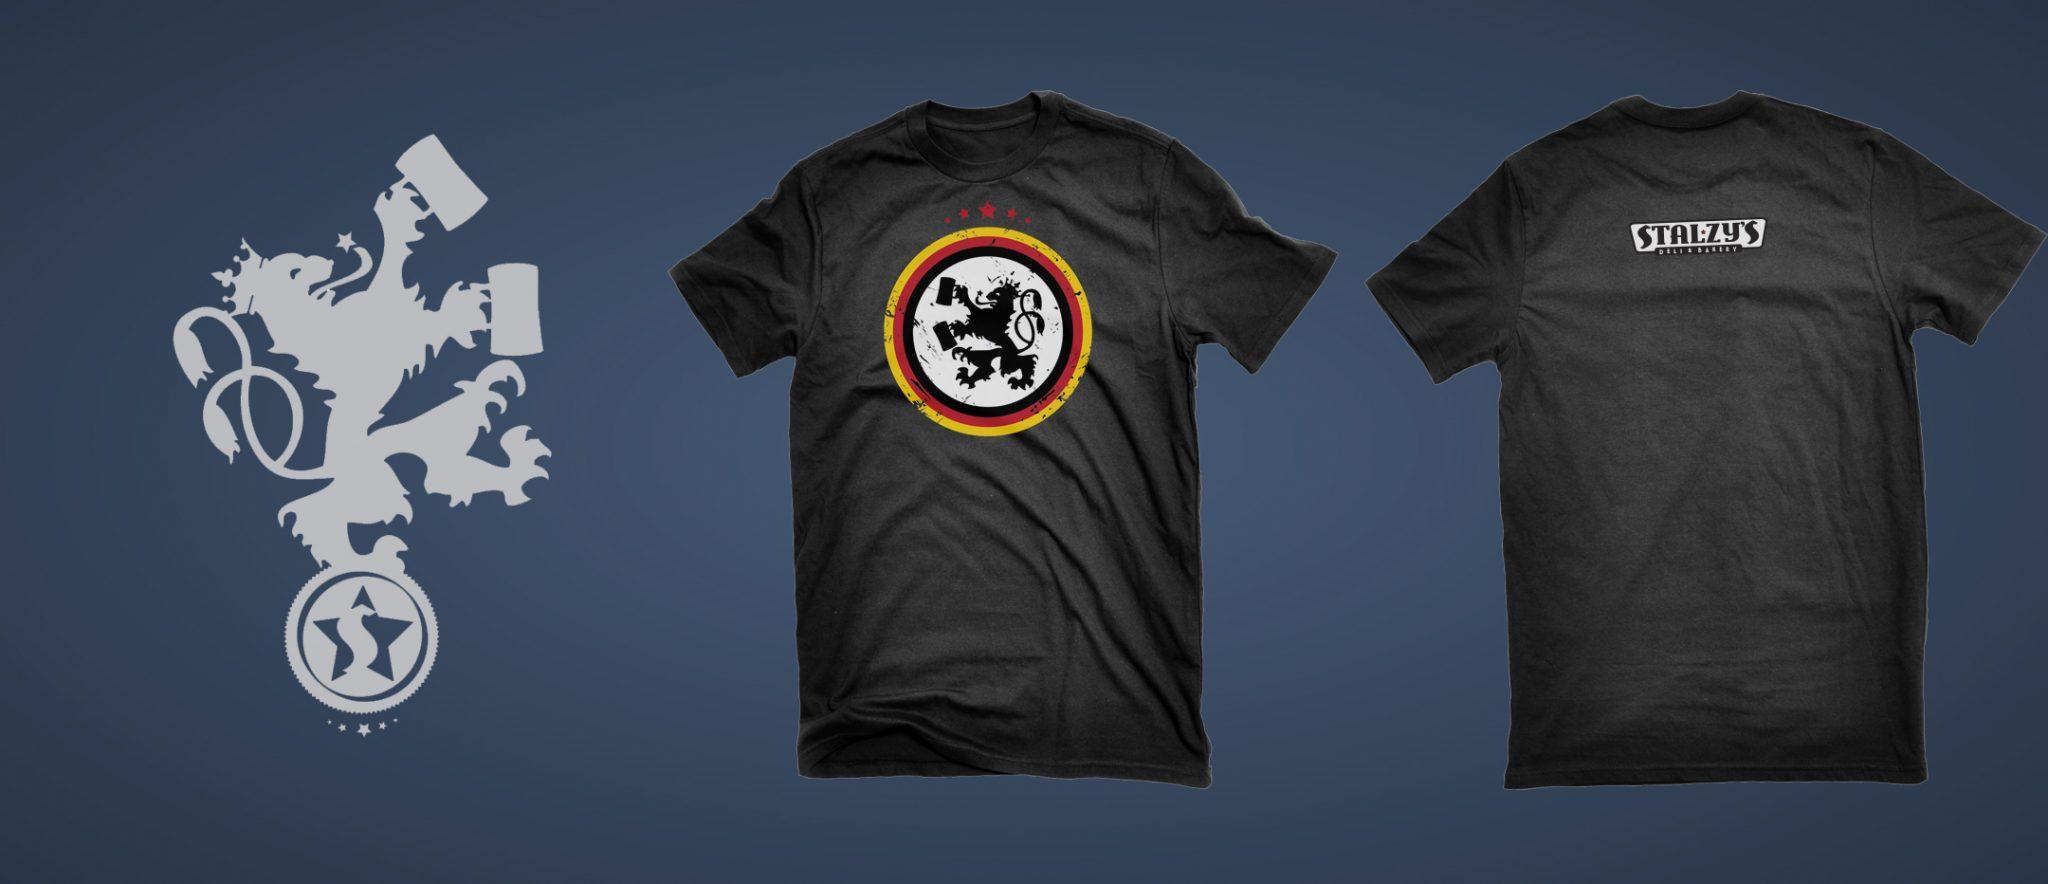 Oktoberfest T-Shirt and Logo Graphic Design